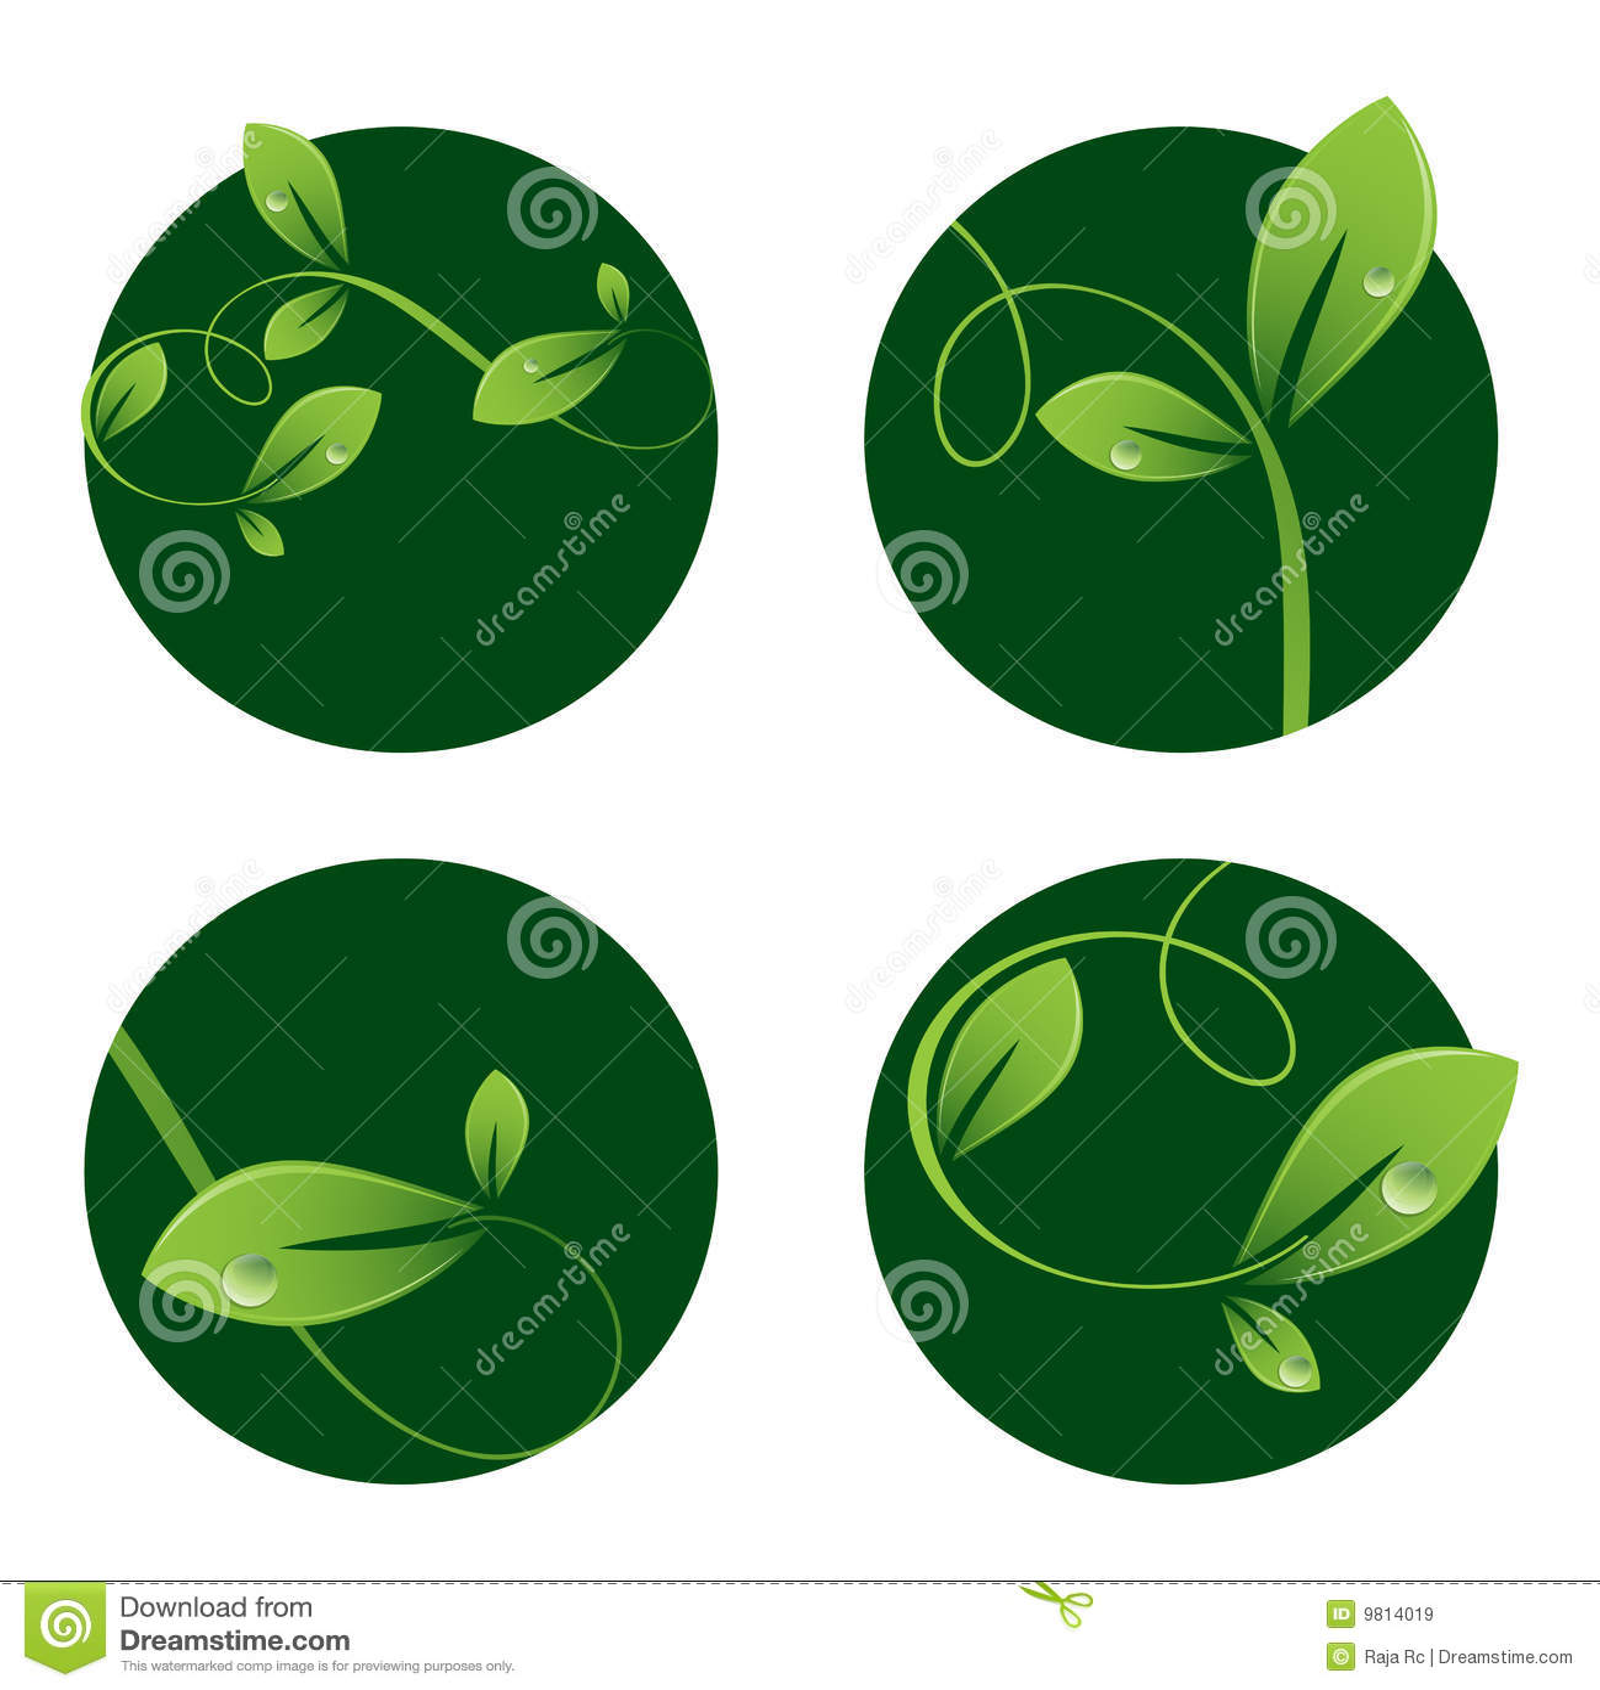 Book logos stock vector image 42714029 - Nature Logos Royalty Free Stock Images